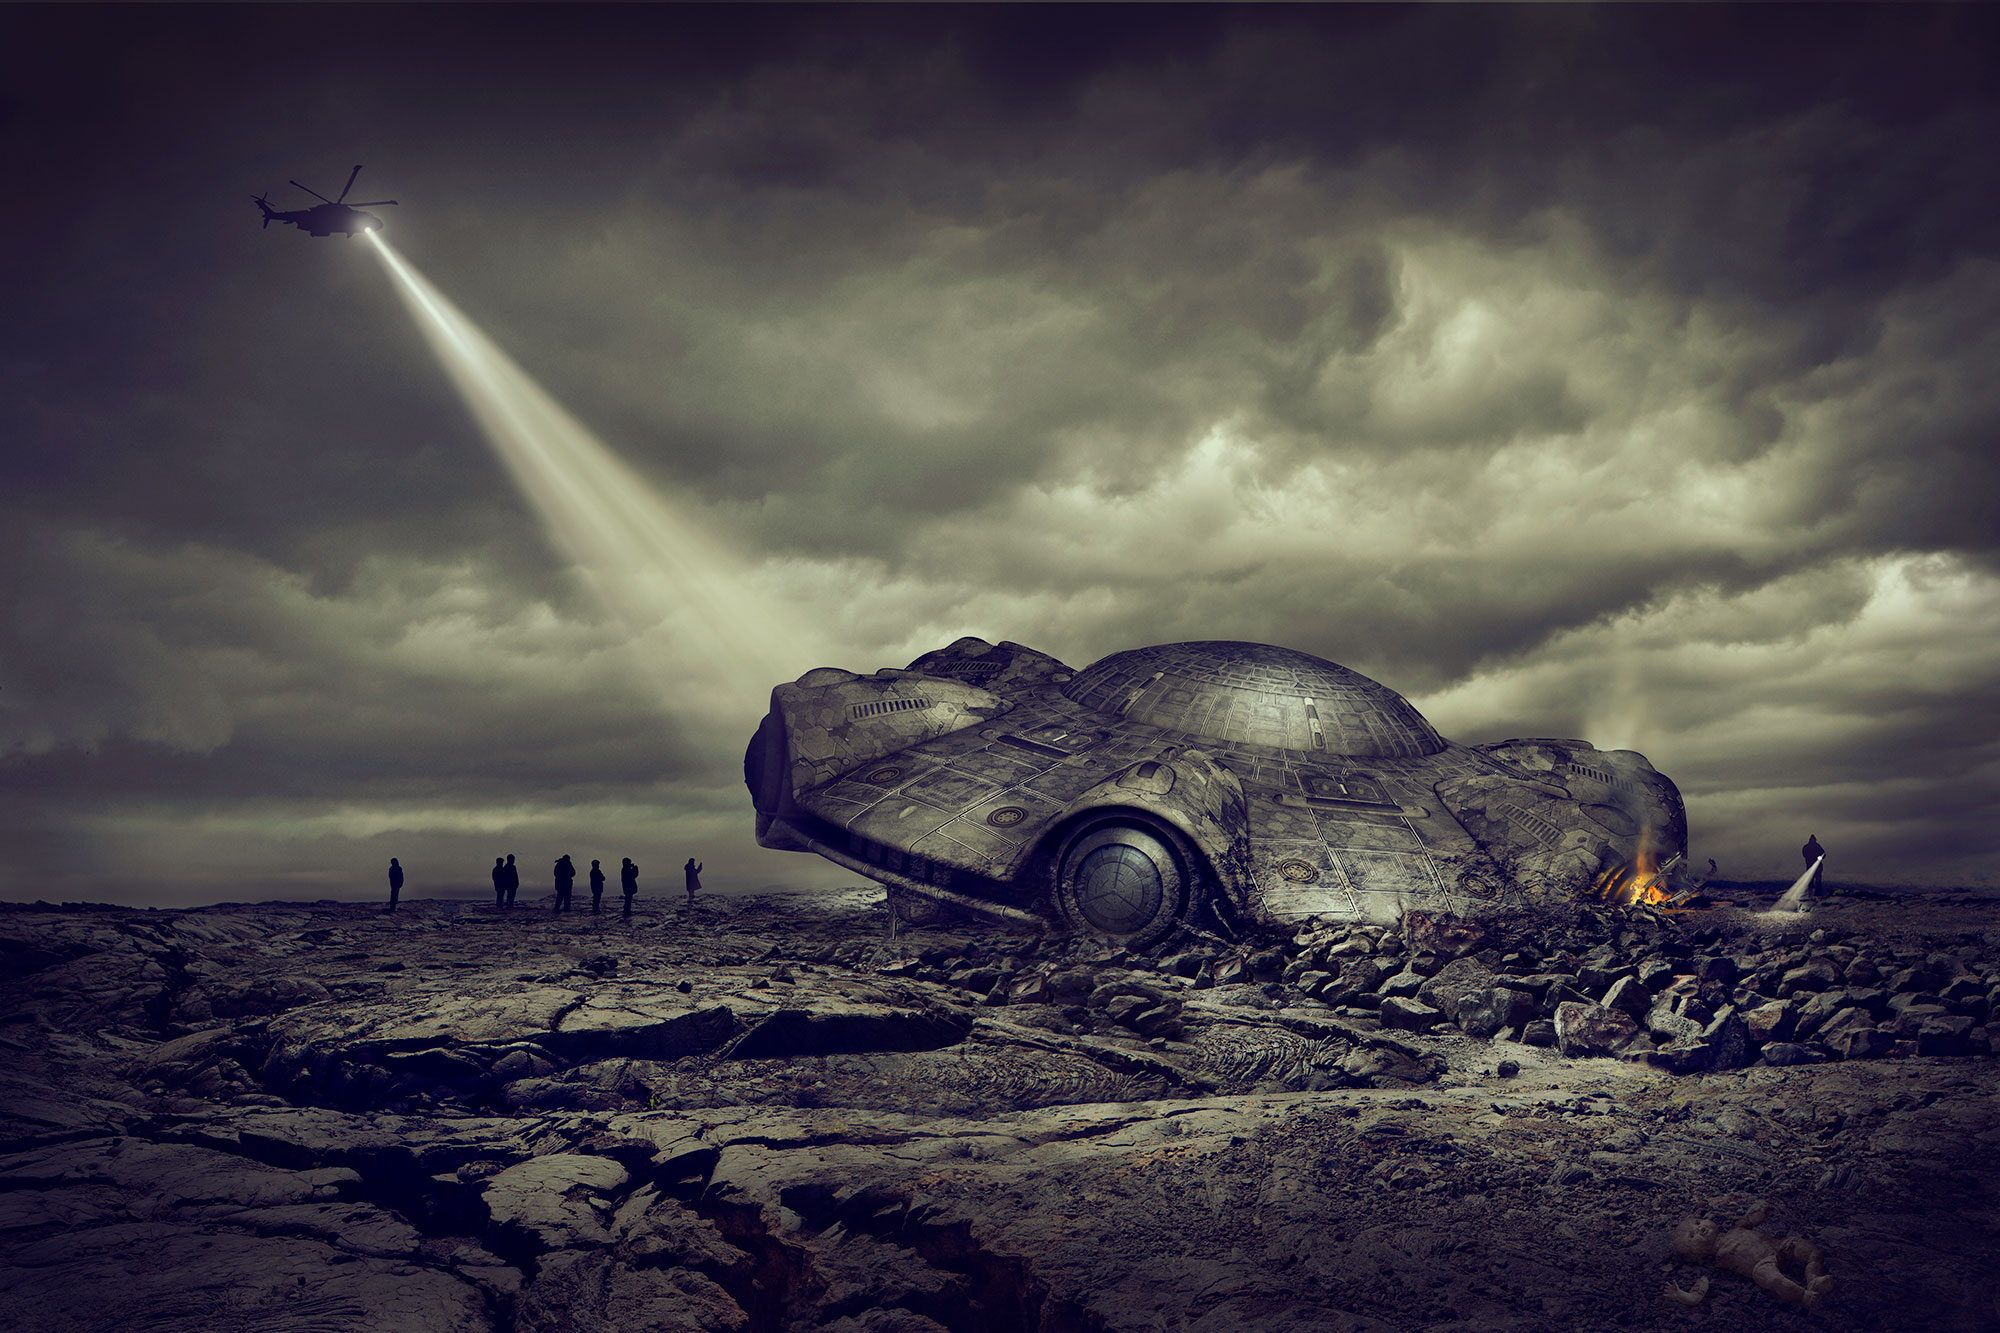 Chris Clor - space ship landed